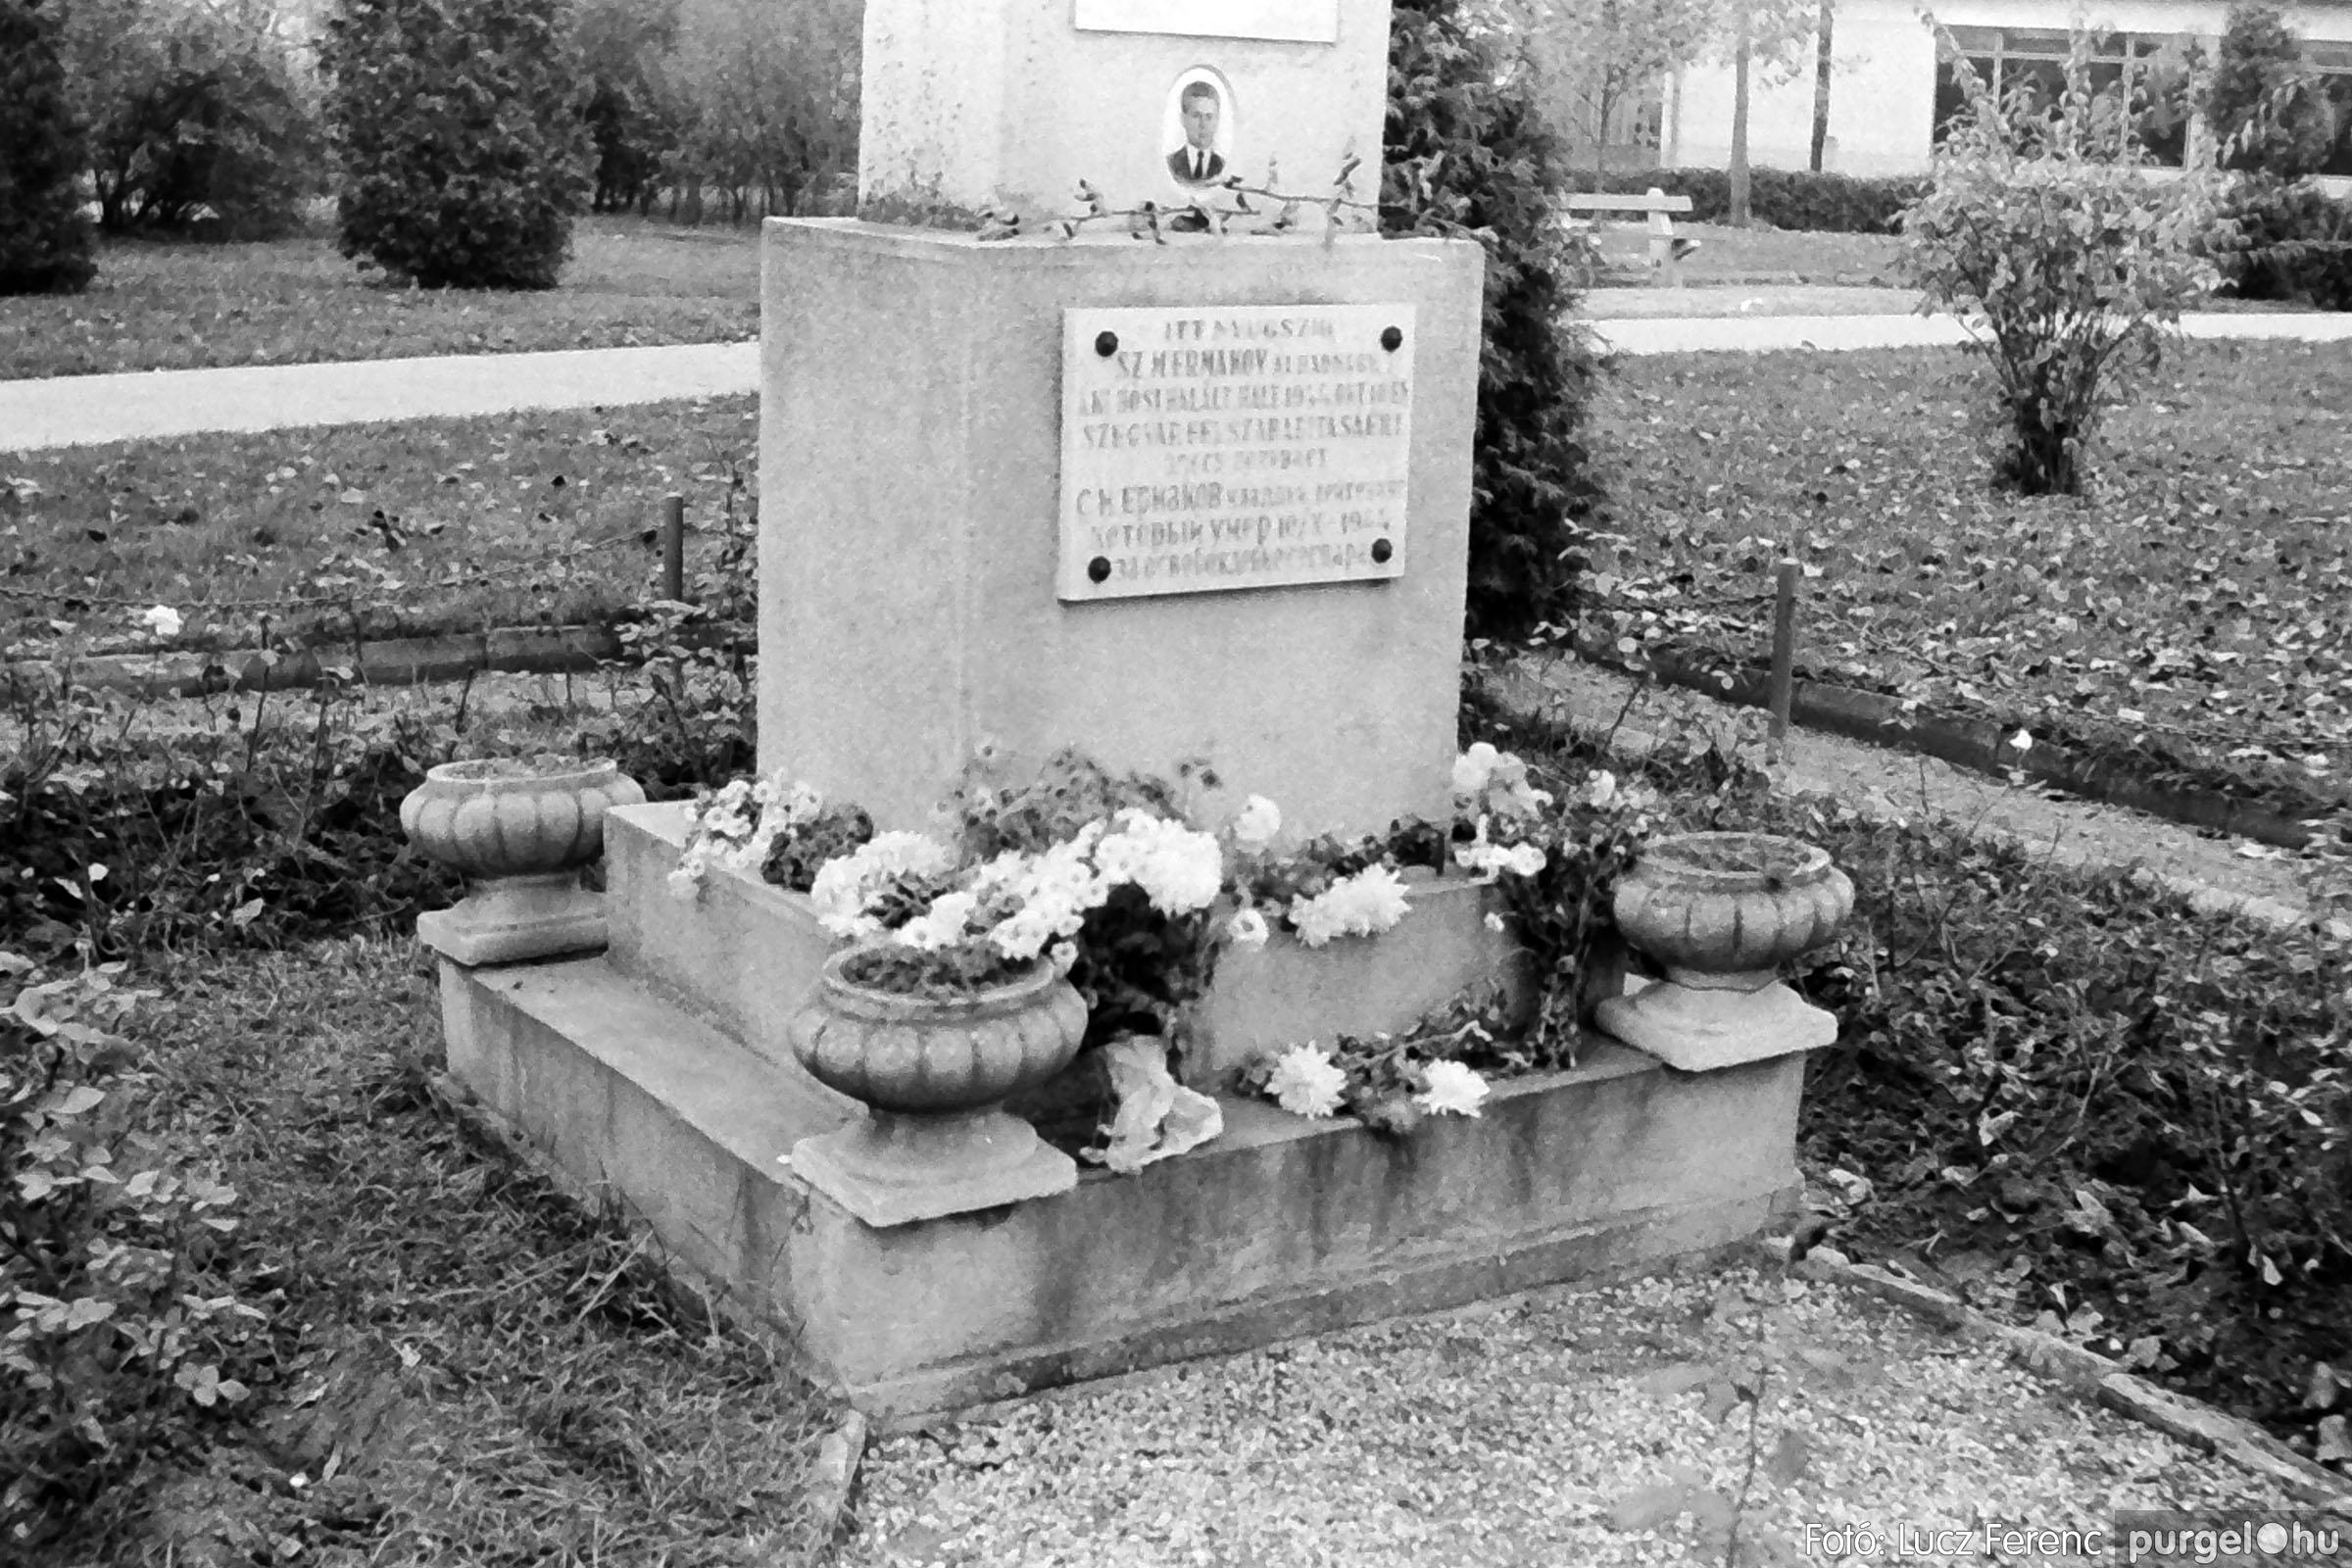 025 1975.10. Szovjet katonai emlékmű 003 - Fotó: Lucz Ferenc IMG00231q.jpg